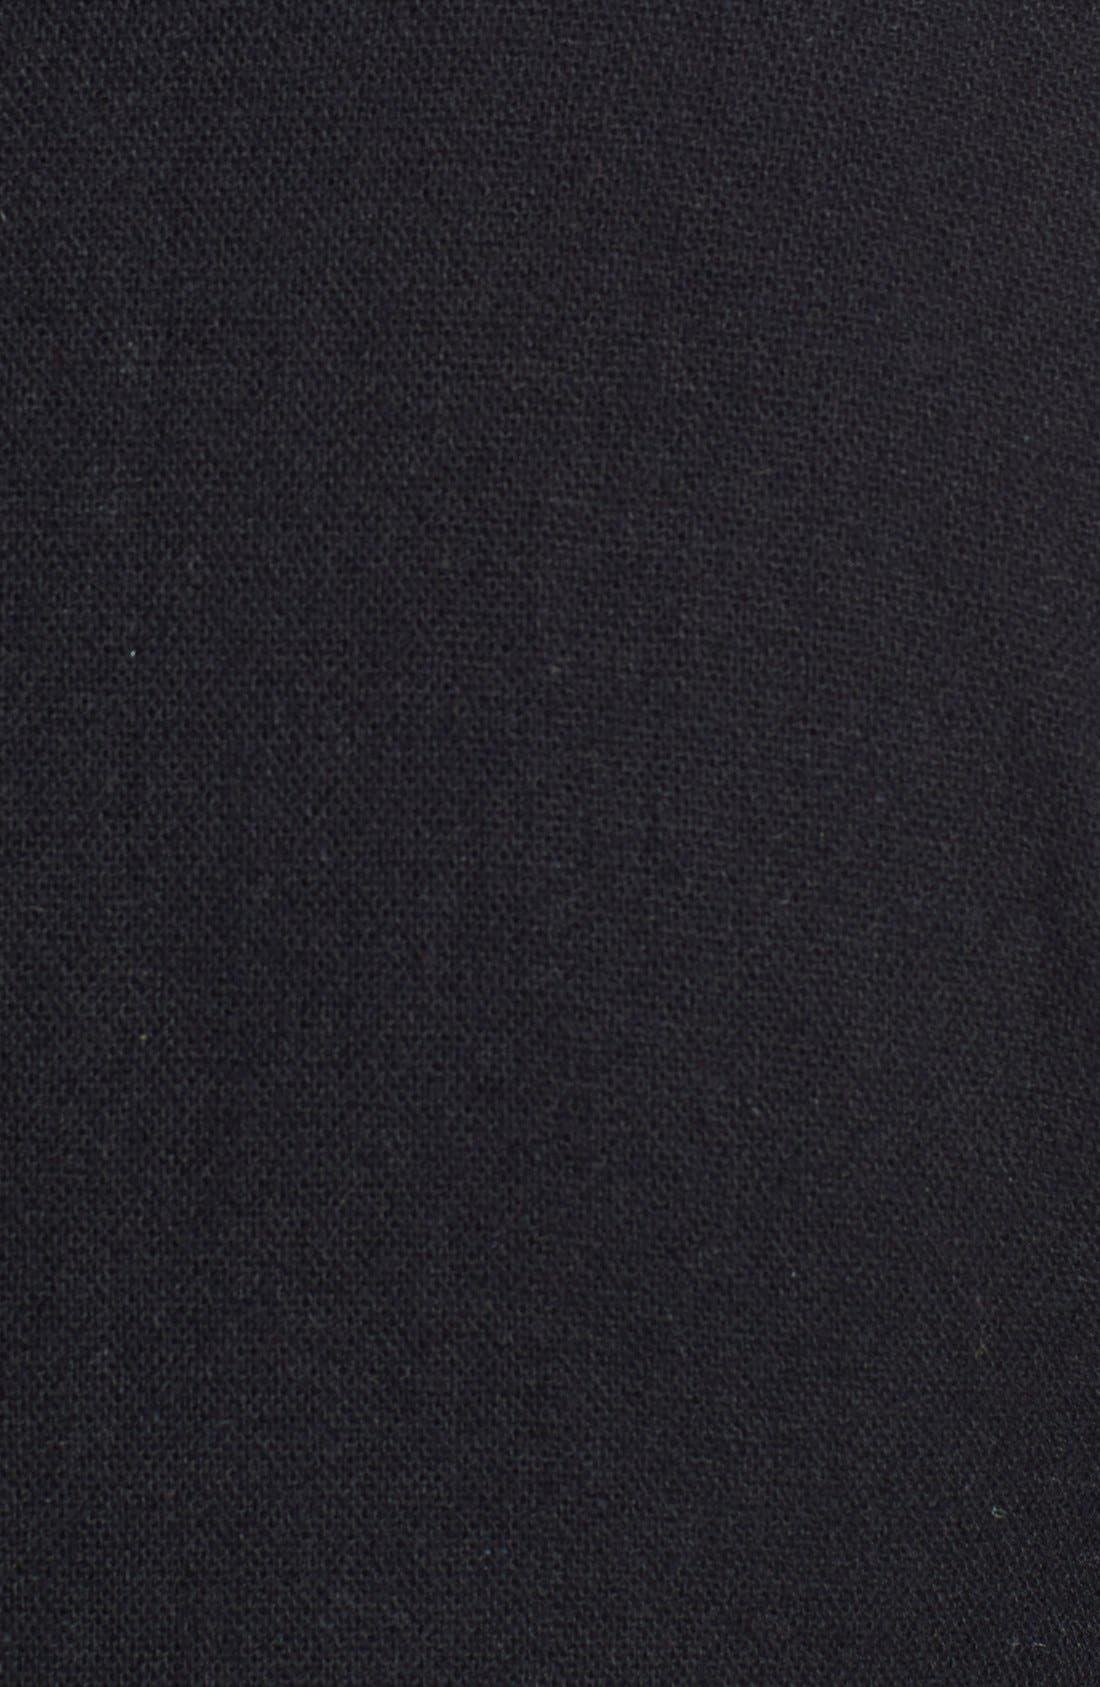 DOCKERS<SUP>®</SUP>, Dockers Trim Fit Wool Blend Blazer, Alternate thumbnail 4, color, 001